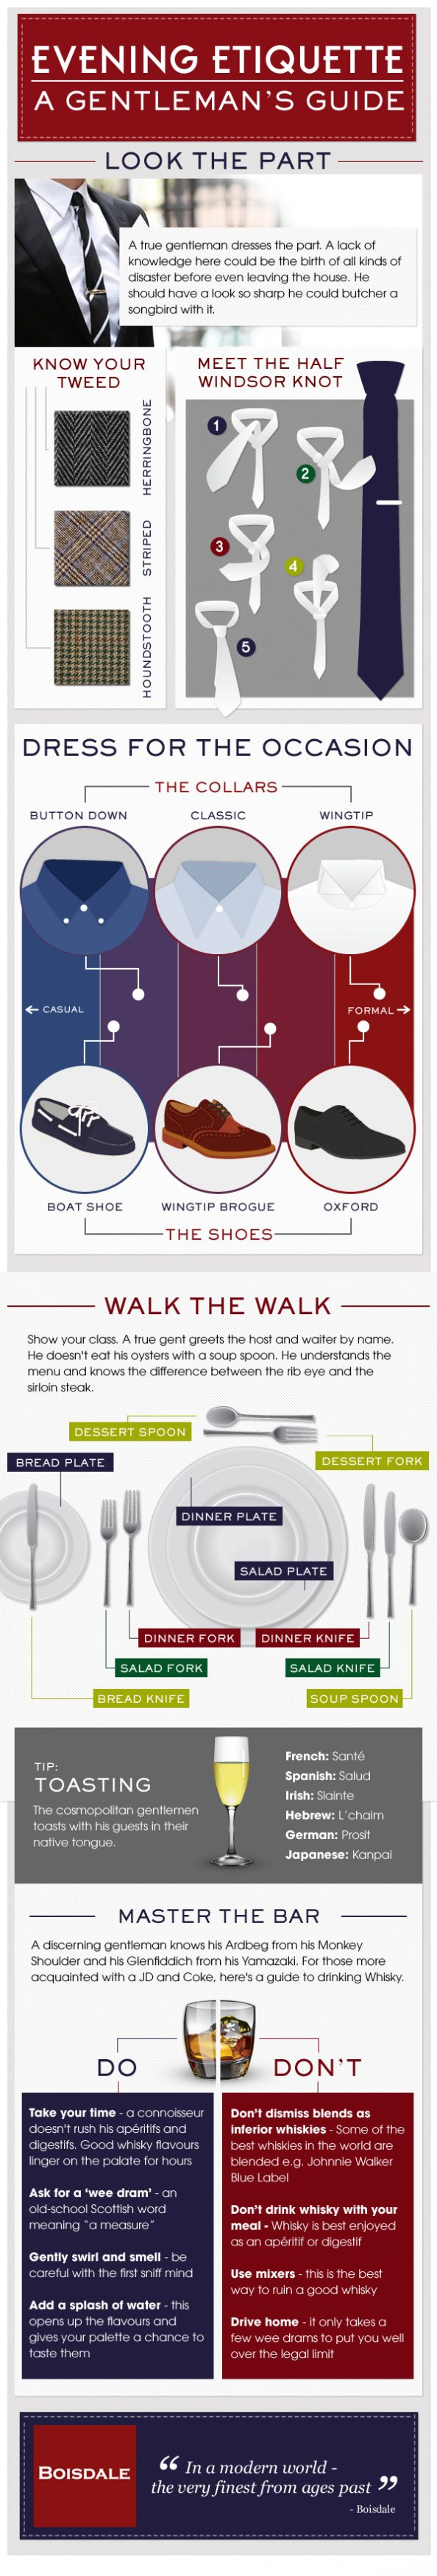 A Gentlemans Guide to Evening Etiquette